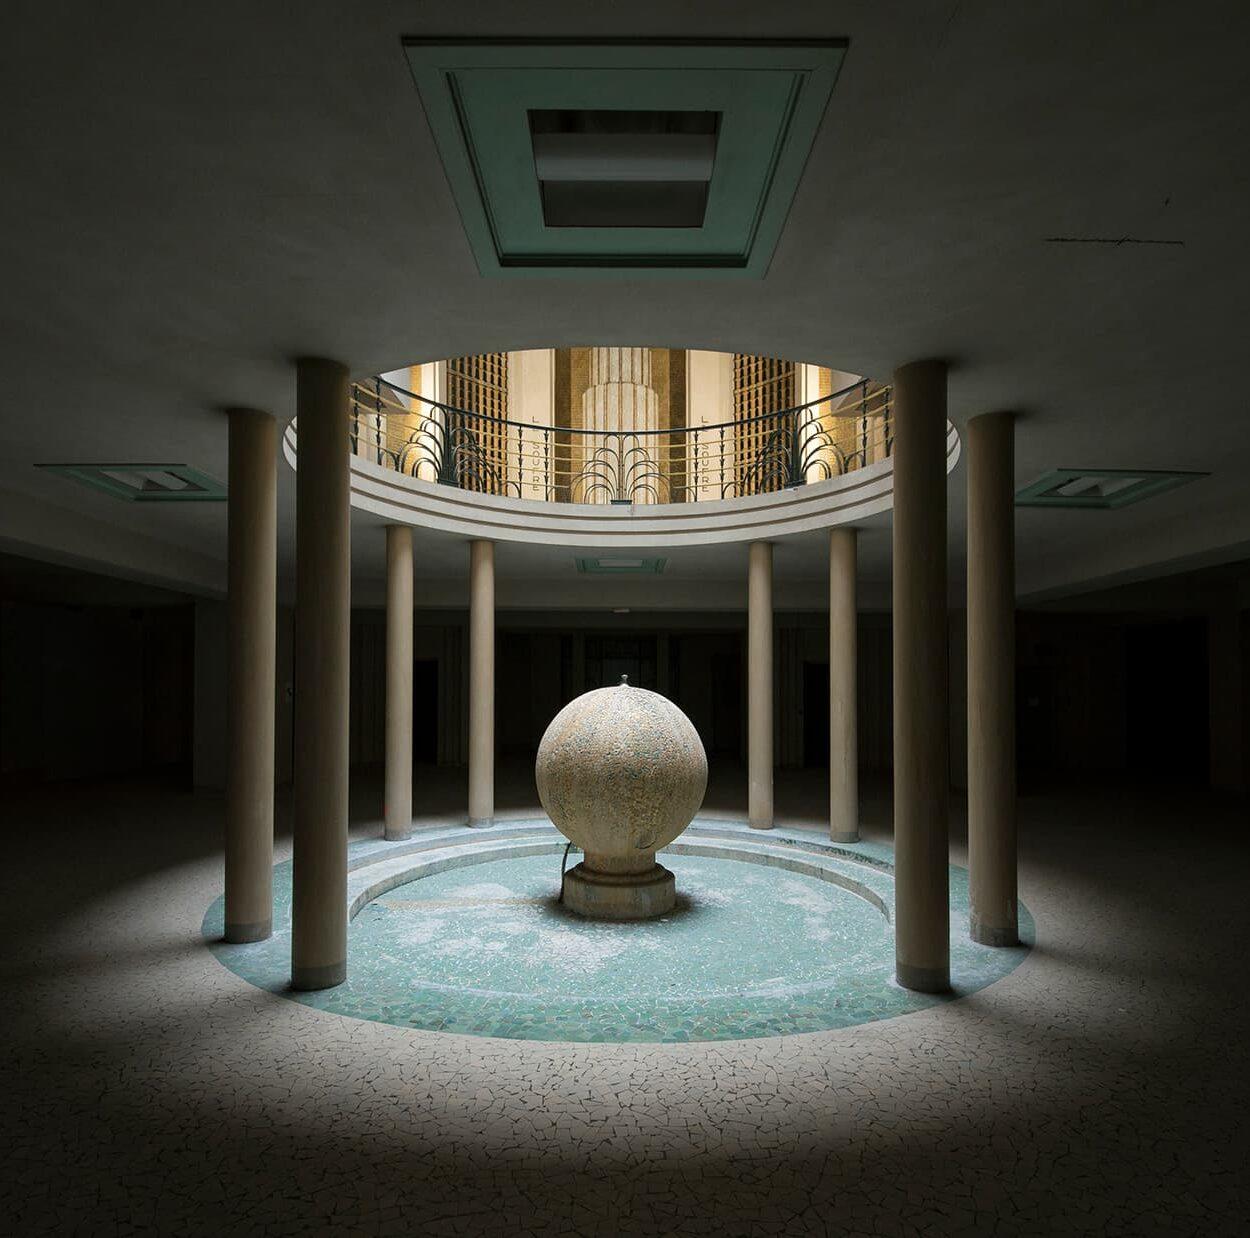 urbex-exploration-france-fontaine-thermes-aix-bains